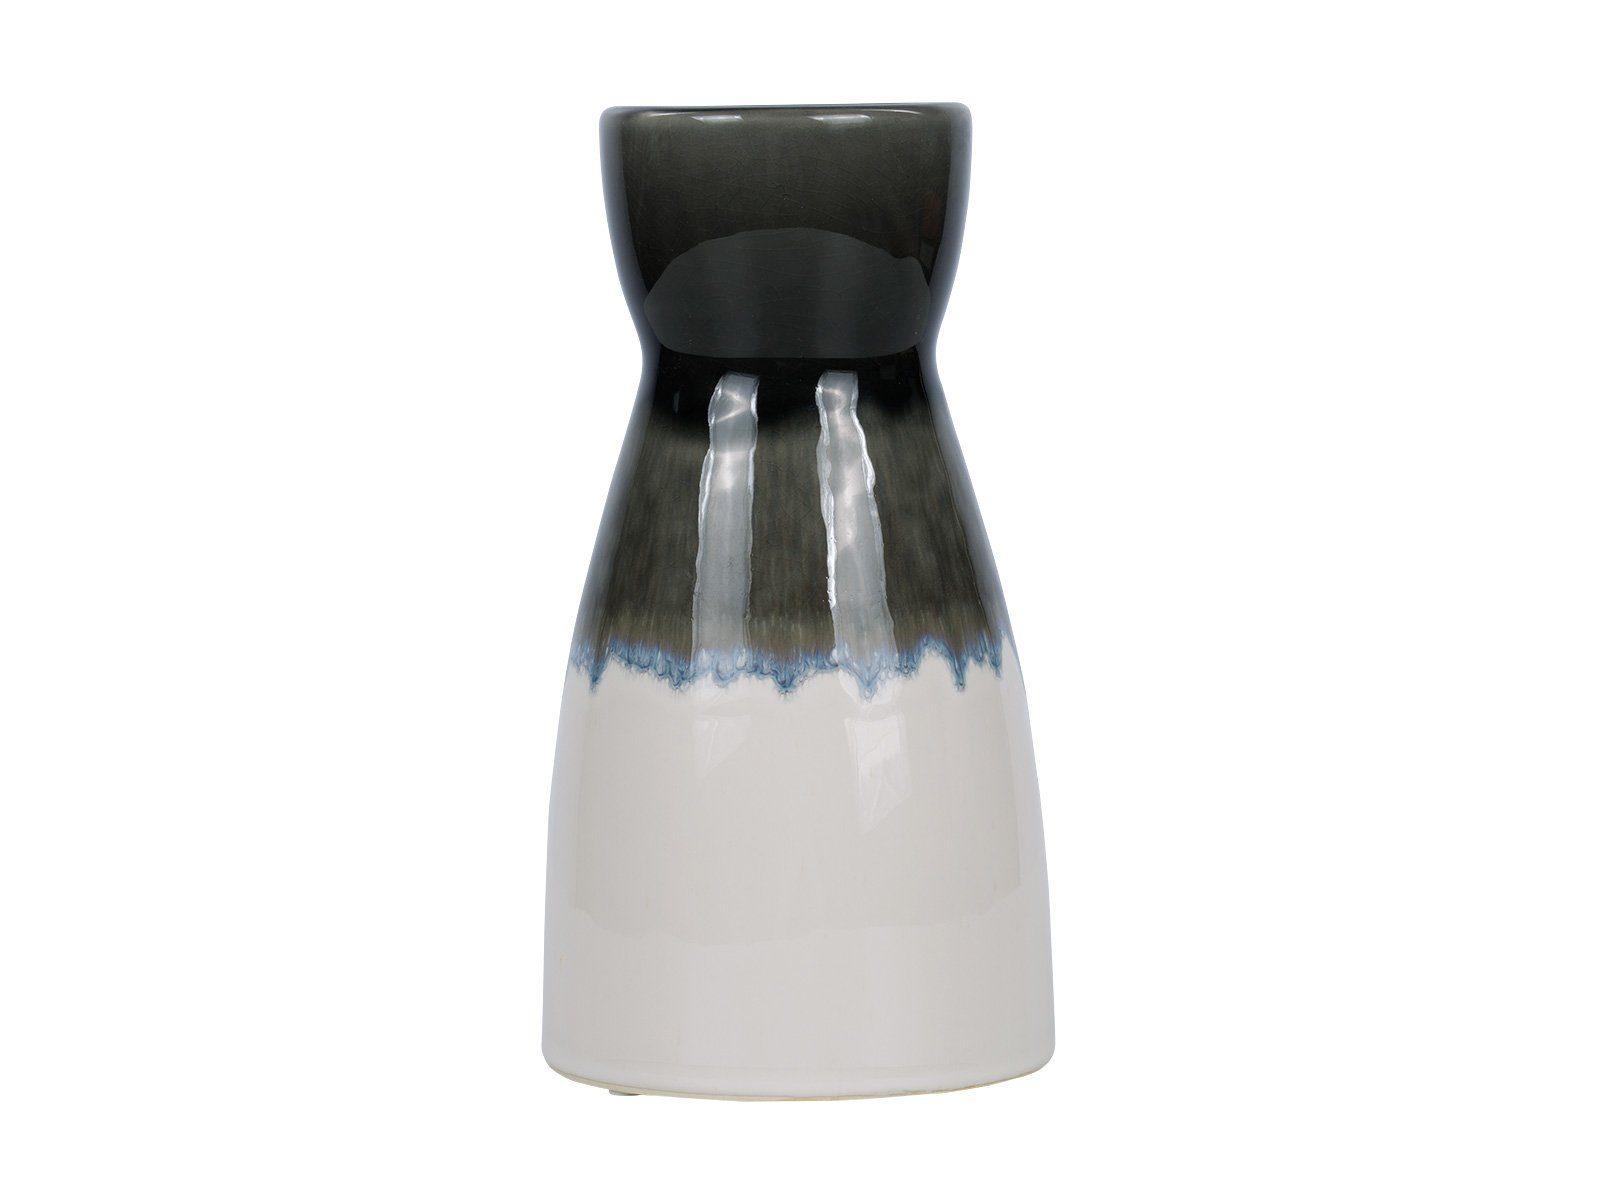 massivum Vasen aus Keramik